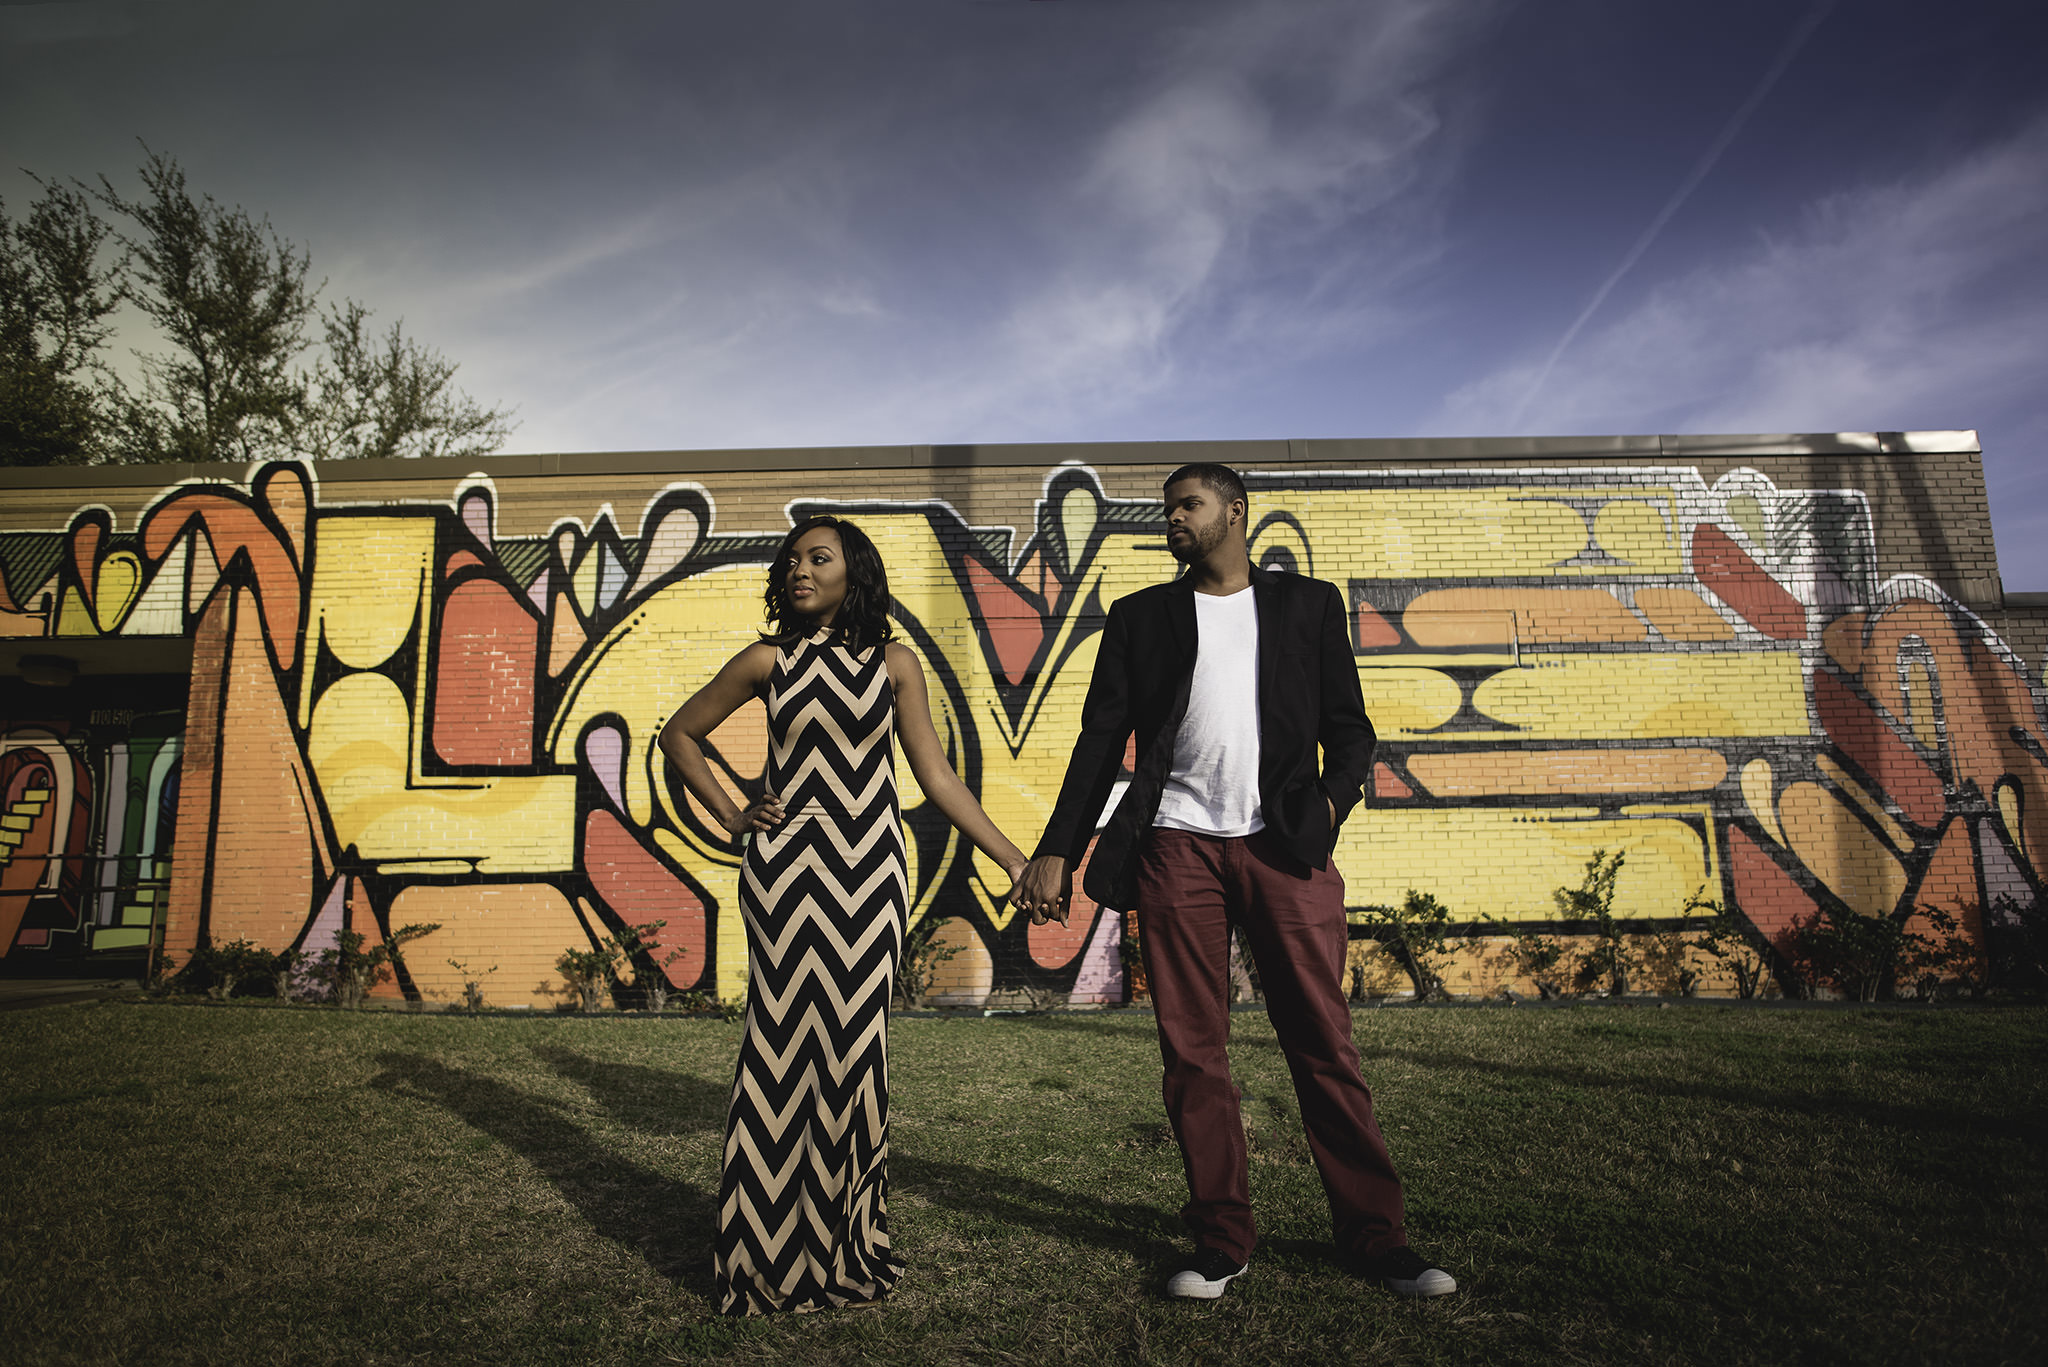 Houston-heights-urban-art-engagement-session-high-fashion-lifestyle-photographer